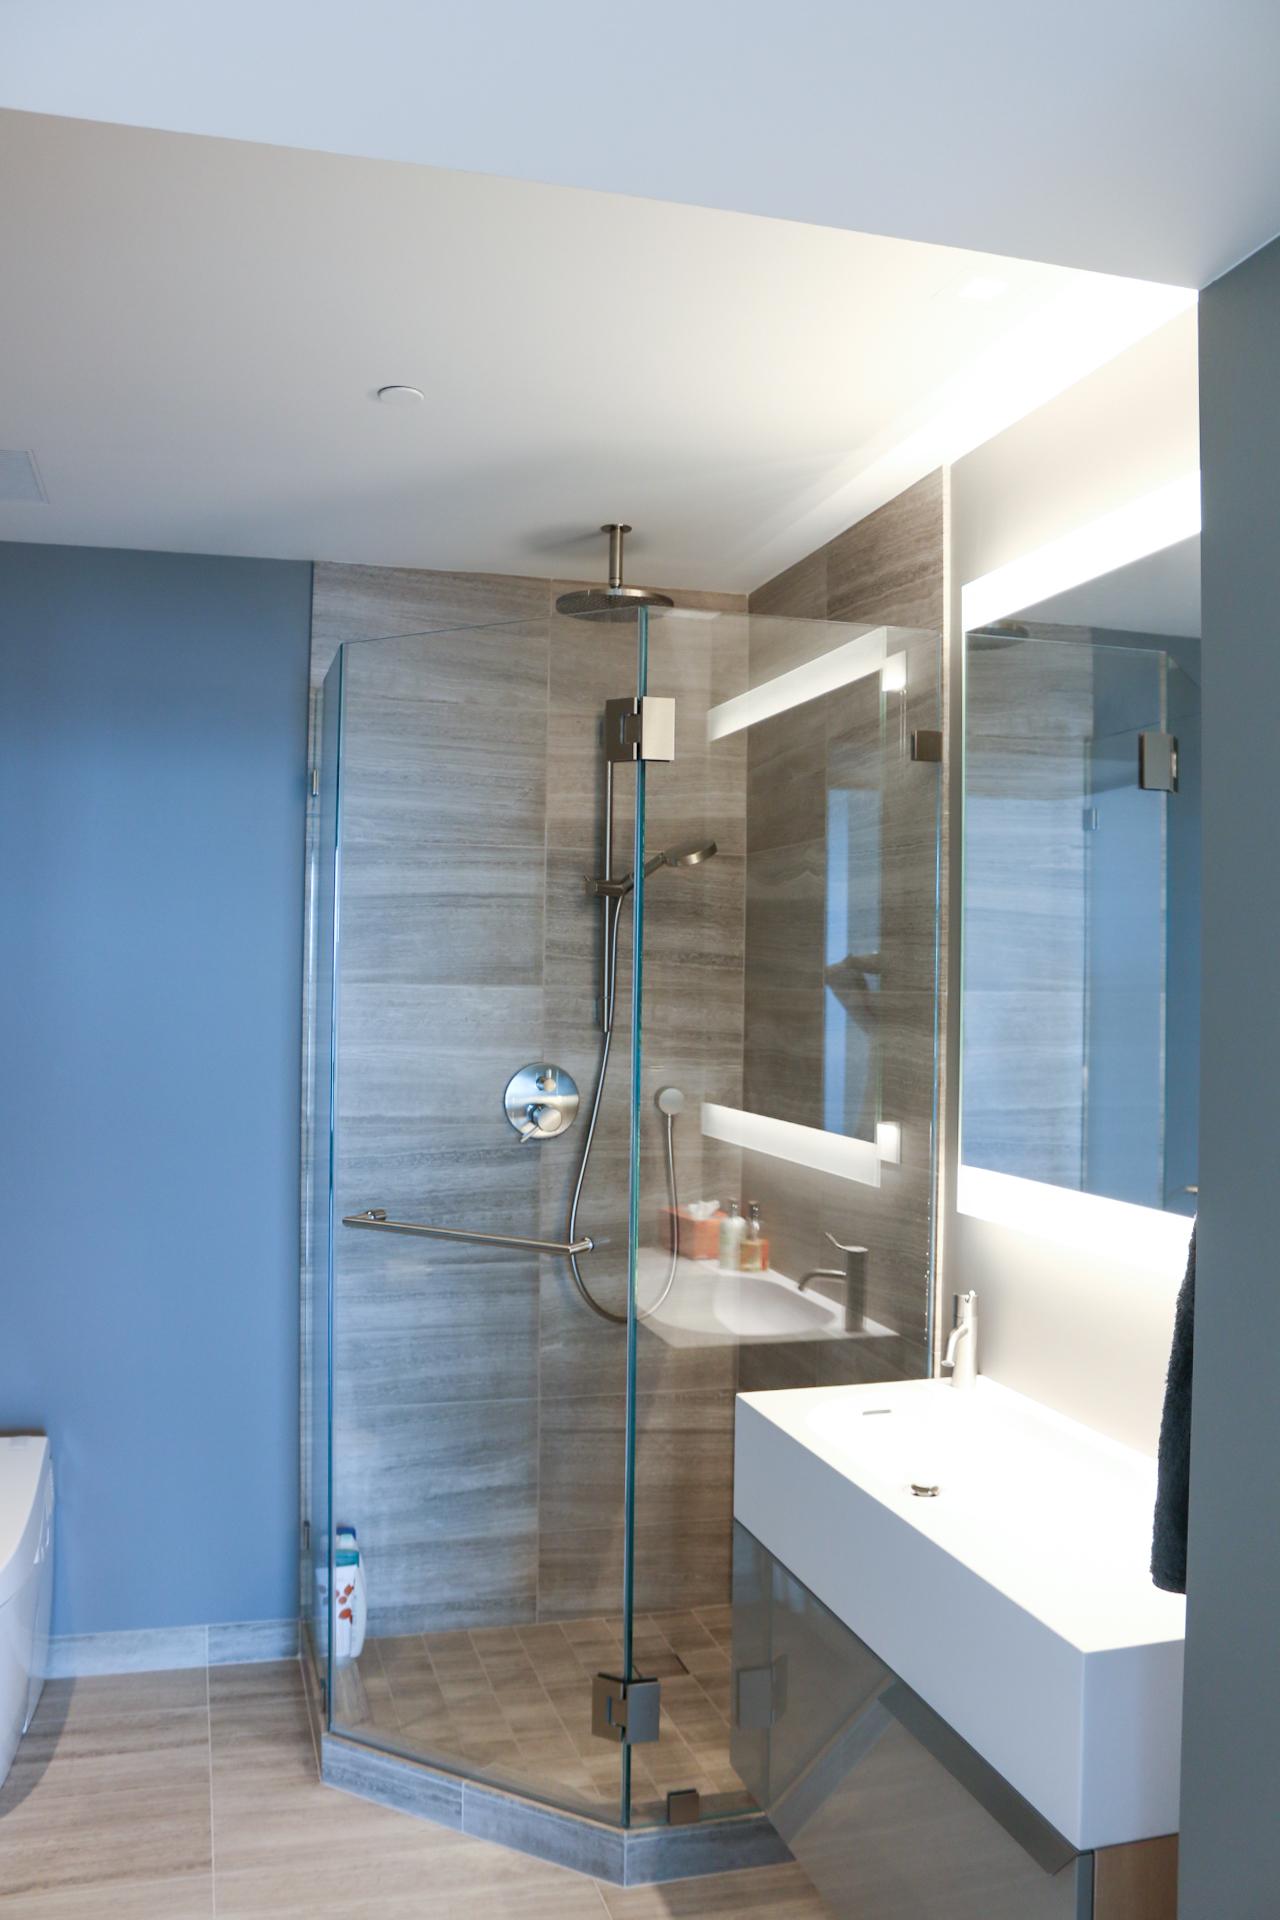 Bathroom with corner shower, limestone tiles and floating vanity